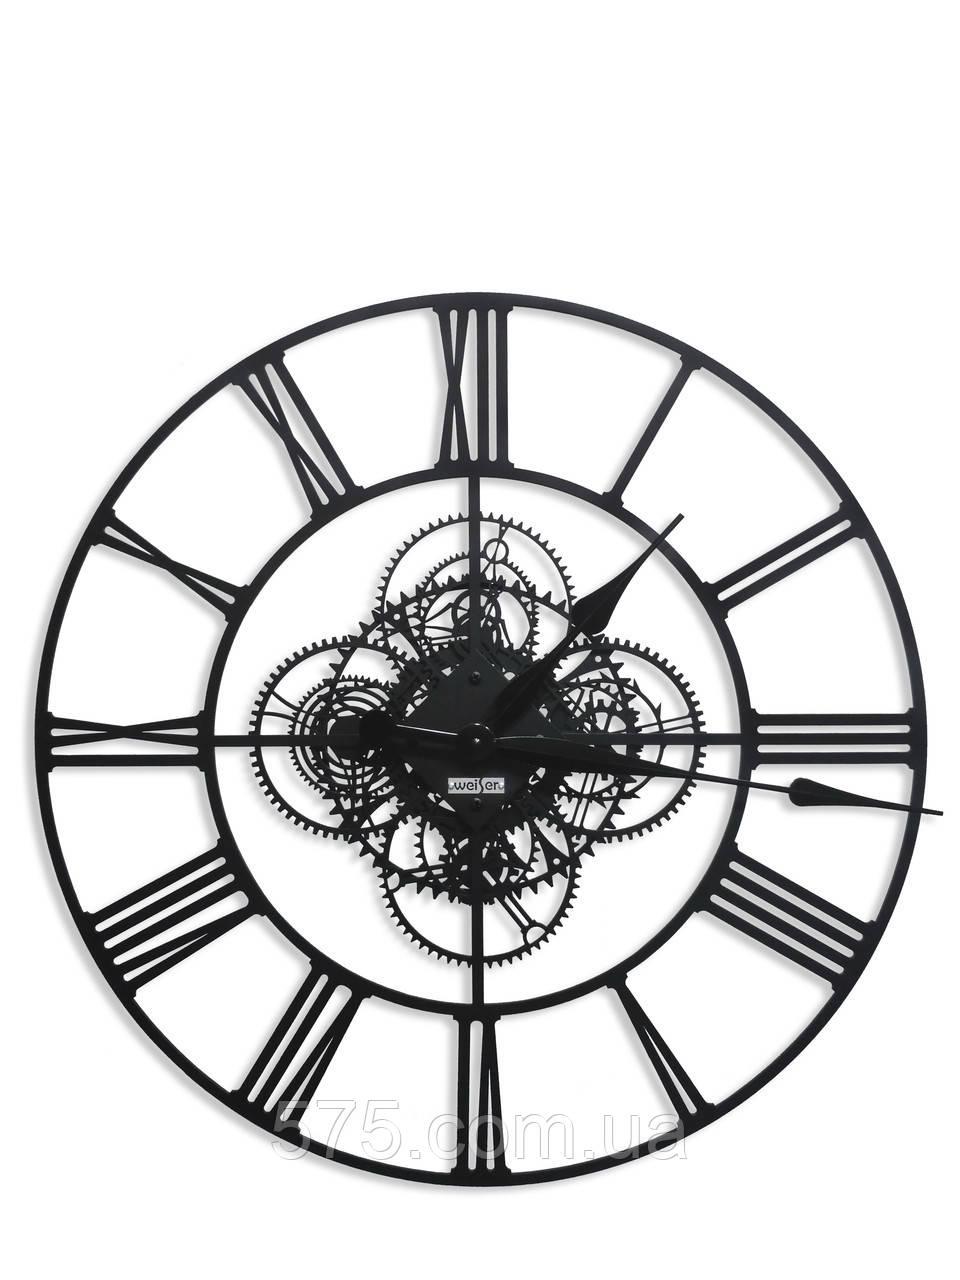 Годинники настінні дизайнерські інтер'єрні TM Weiser BERLIN (600)